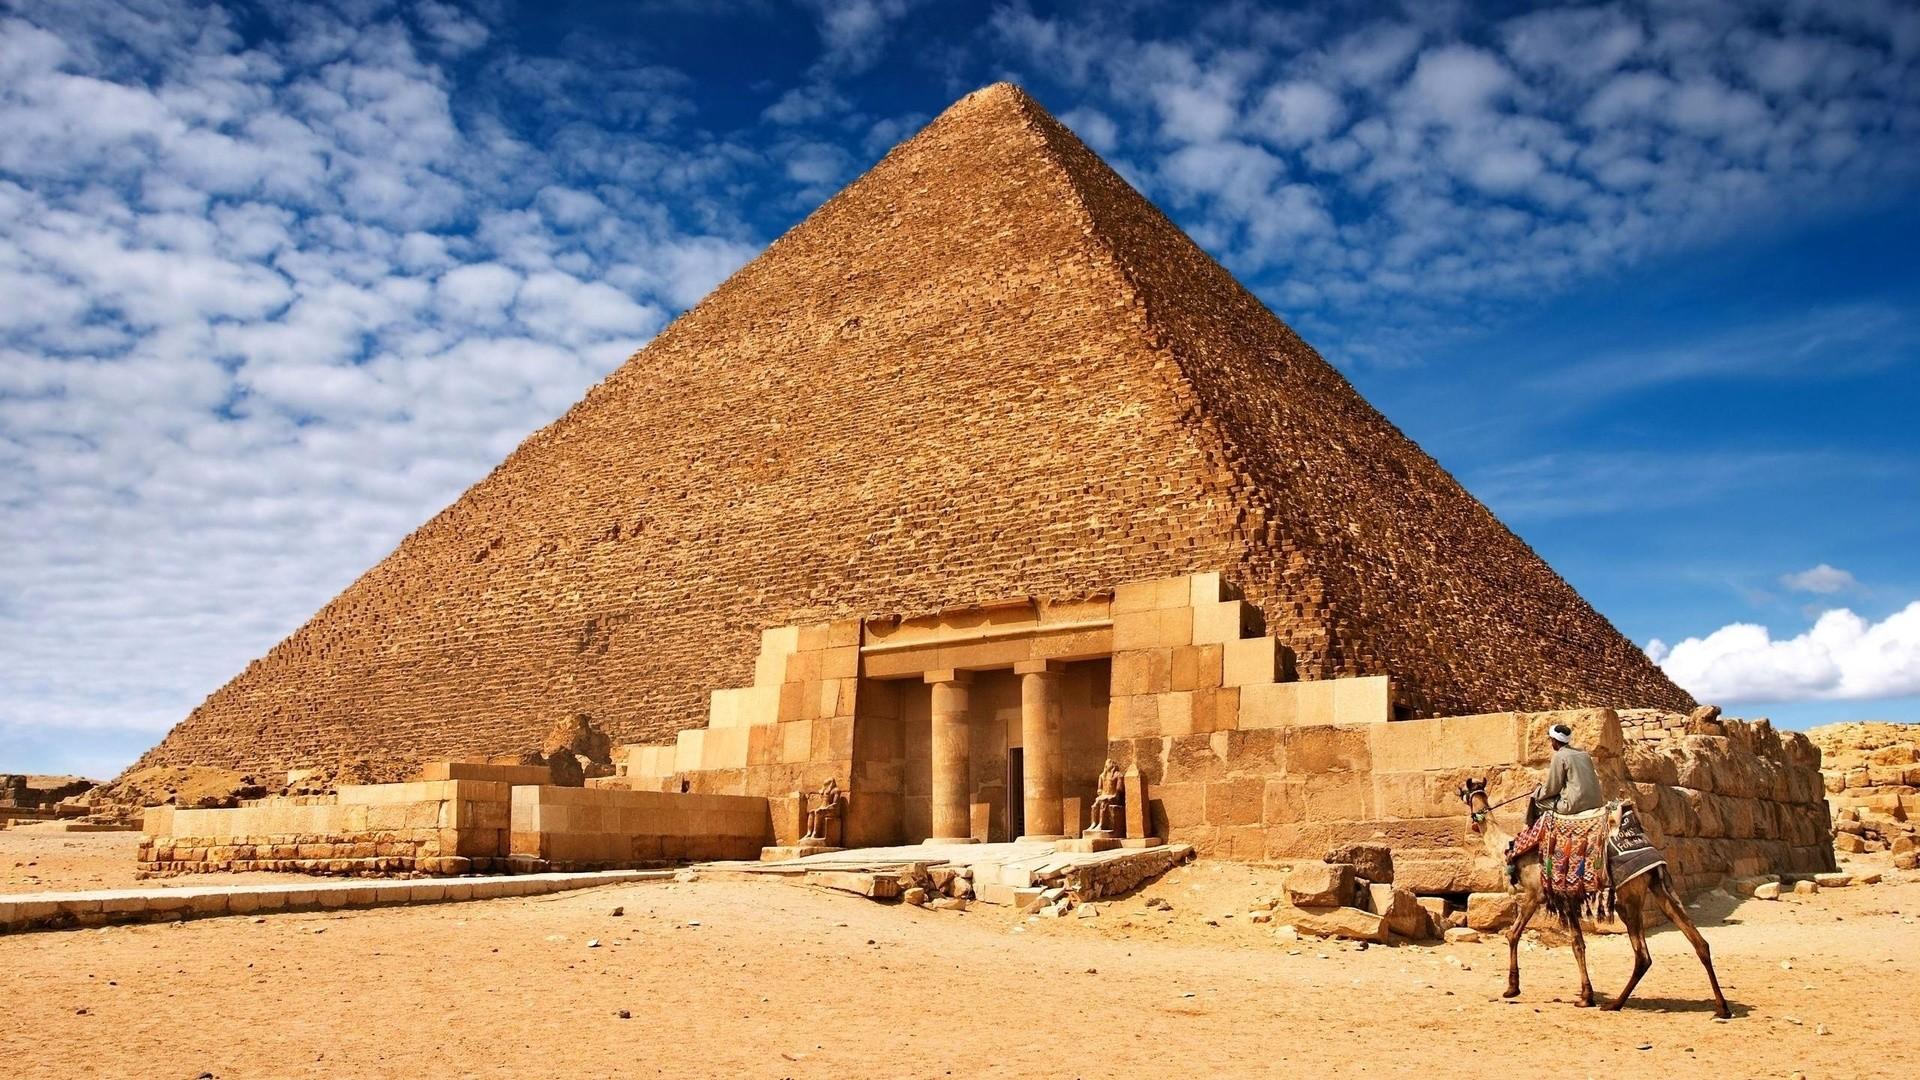 Egypt hd desktop wallpaper